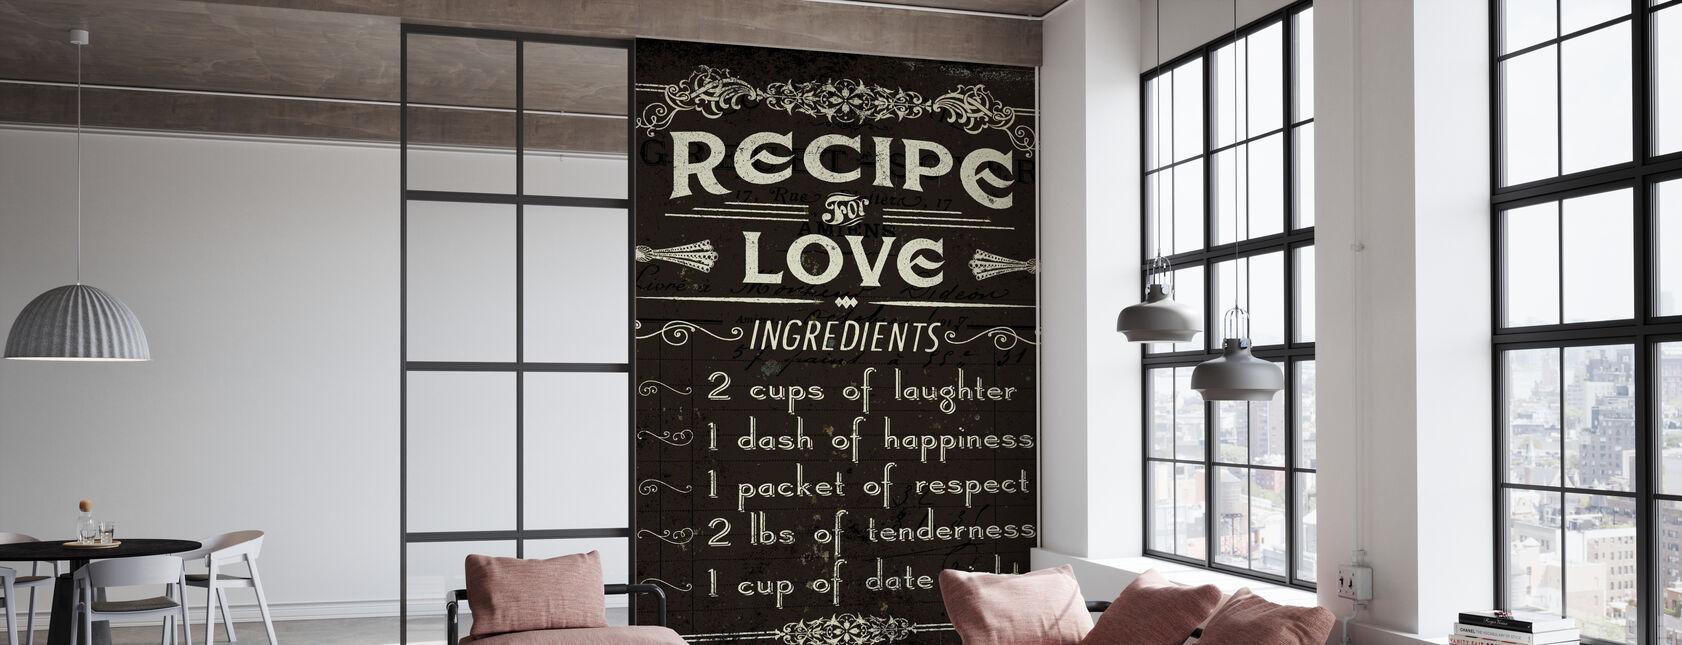 Life Recipes I - Wallpaper - Office